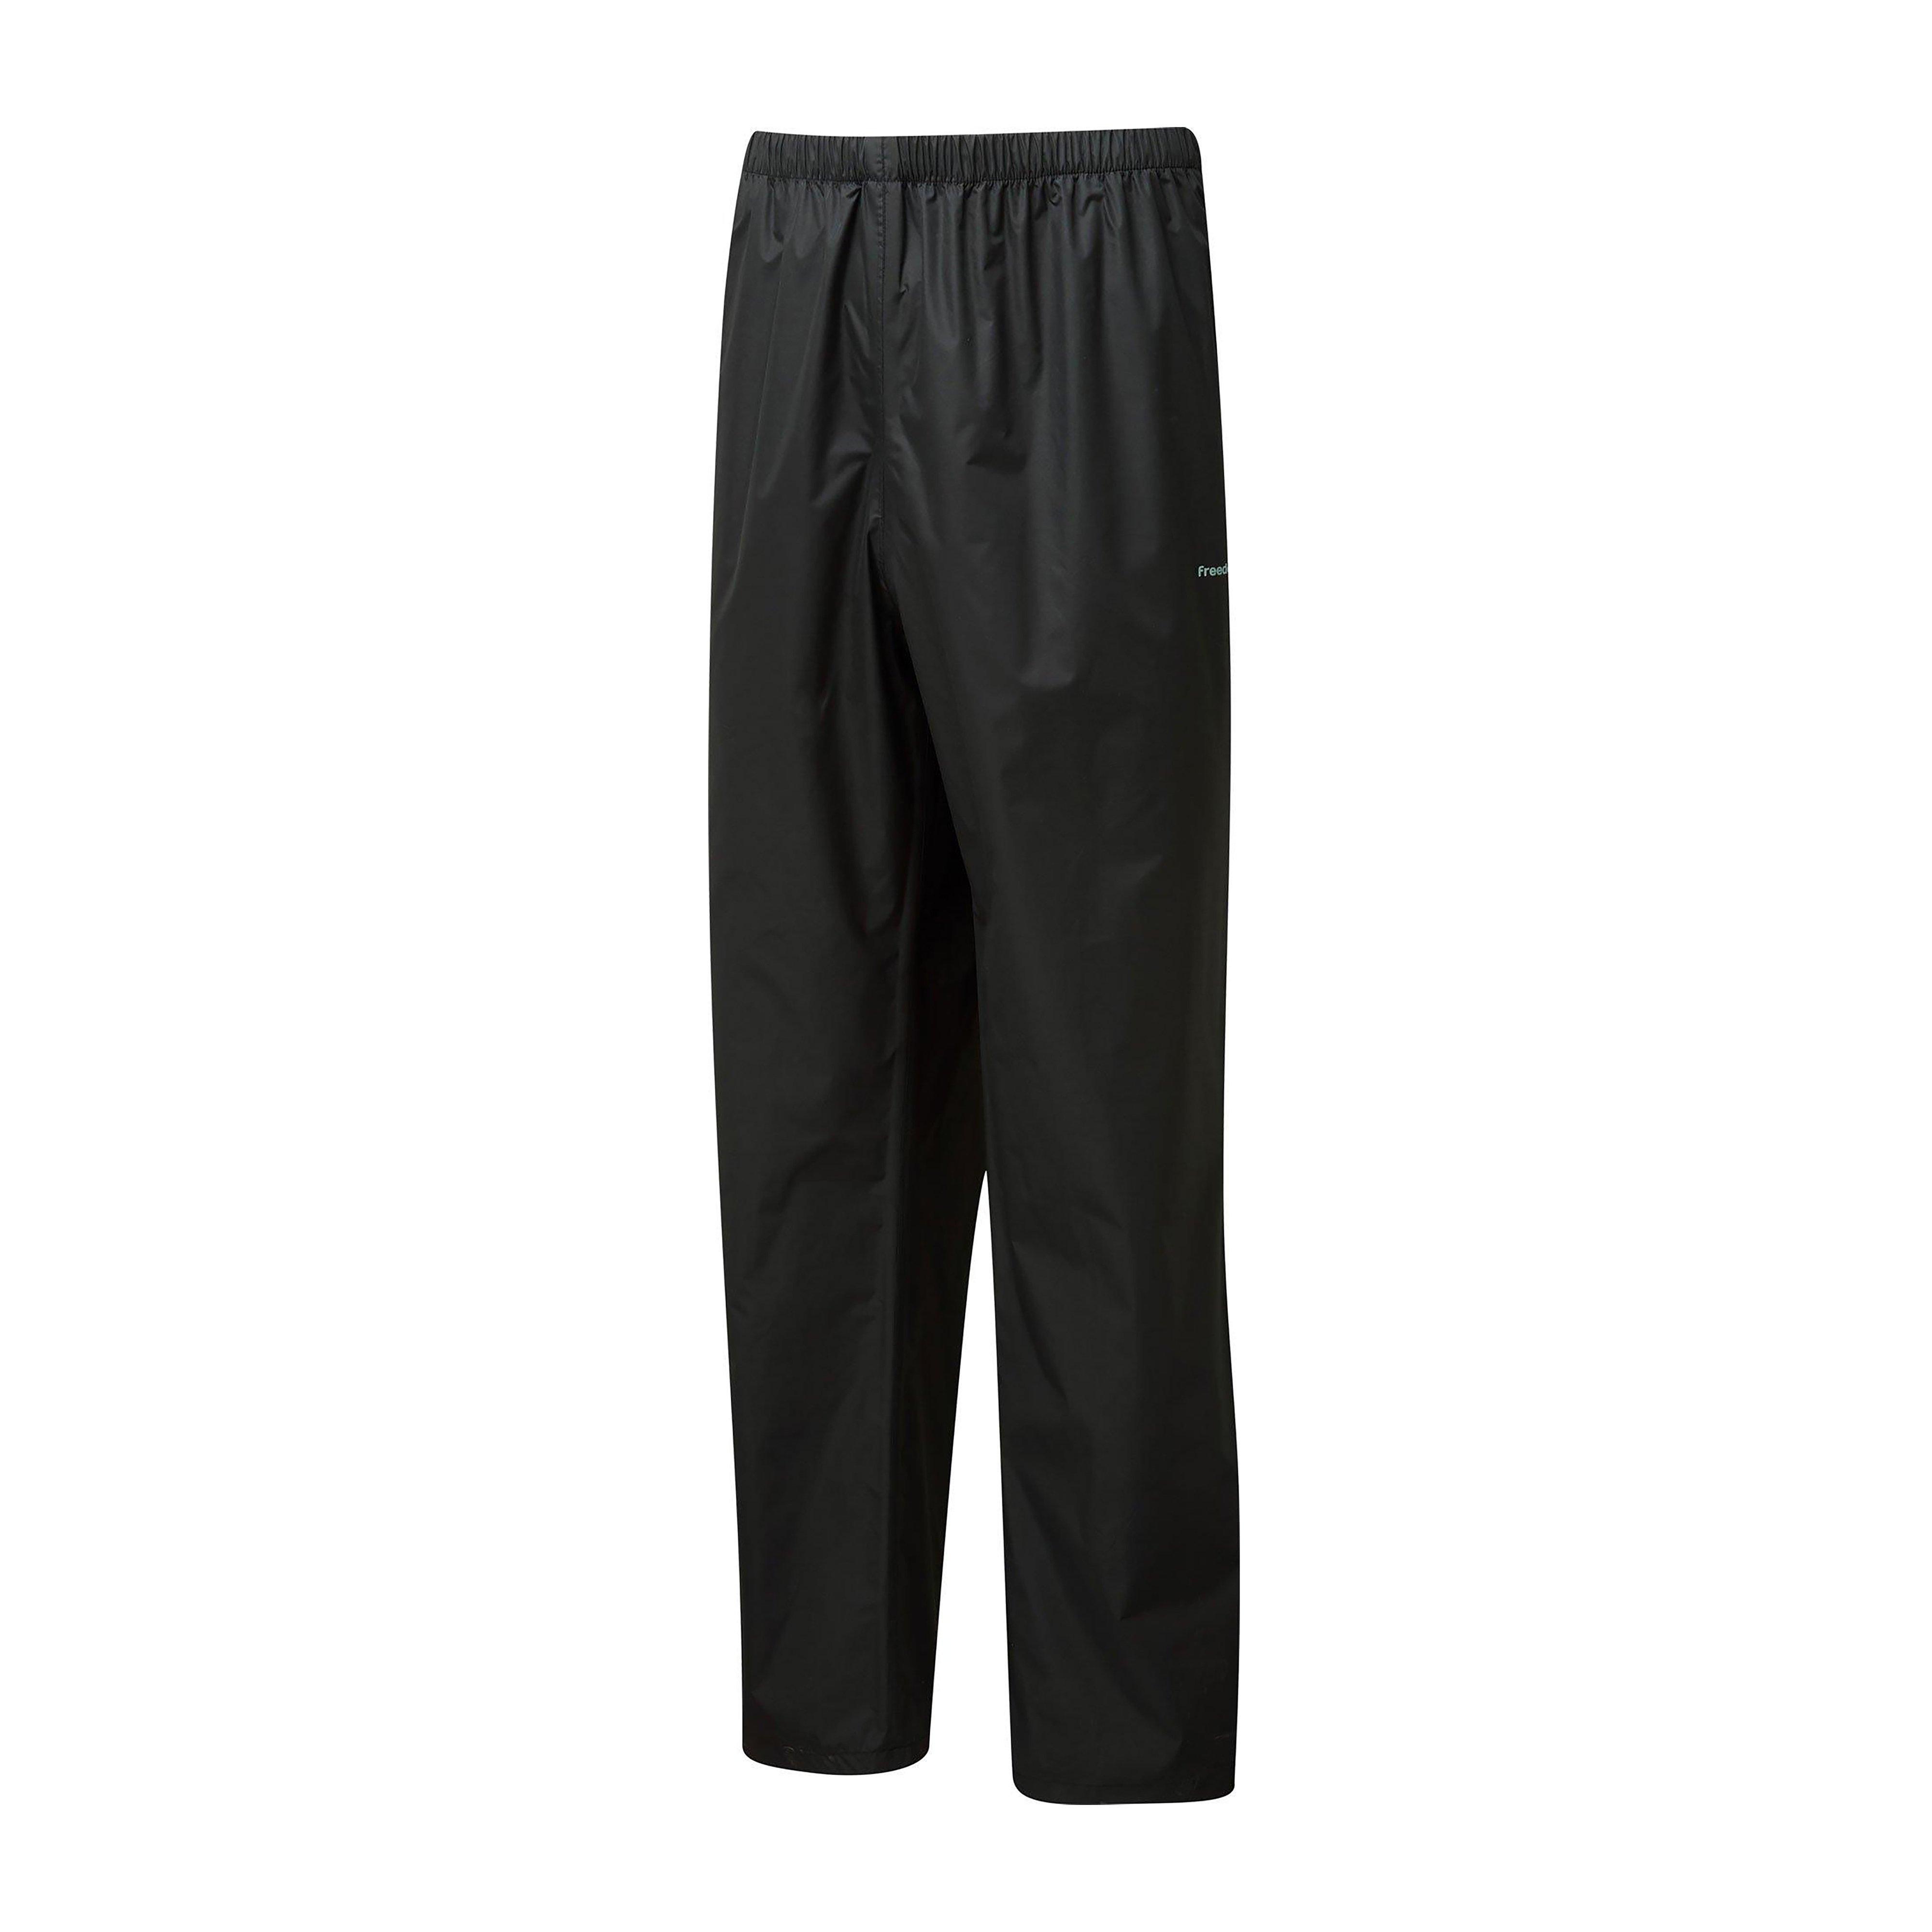 Freedomtrail Freedomtrail Mens Stowaway Waterproof Trouser - Black, Black